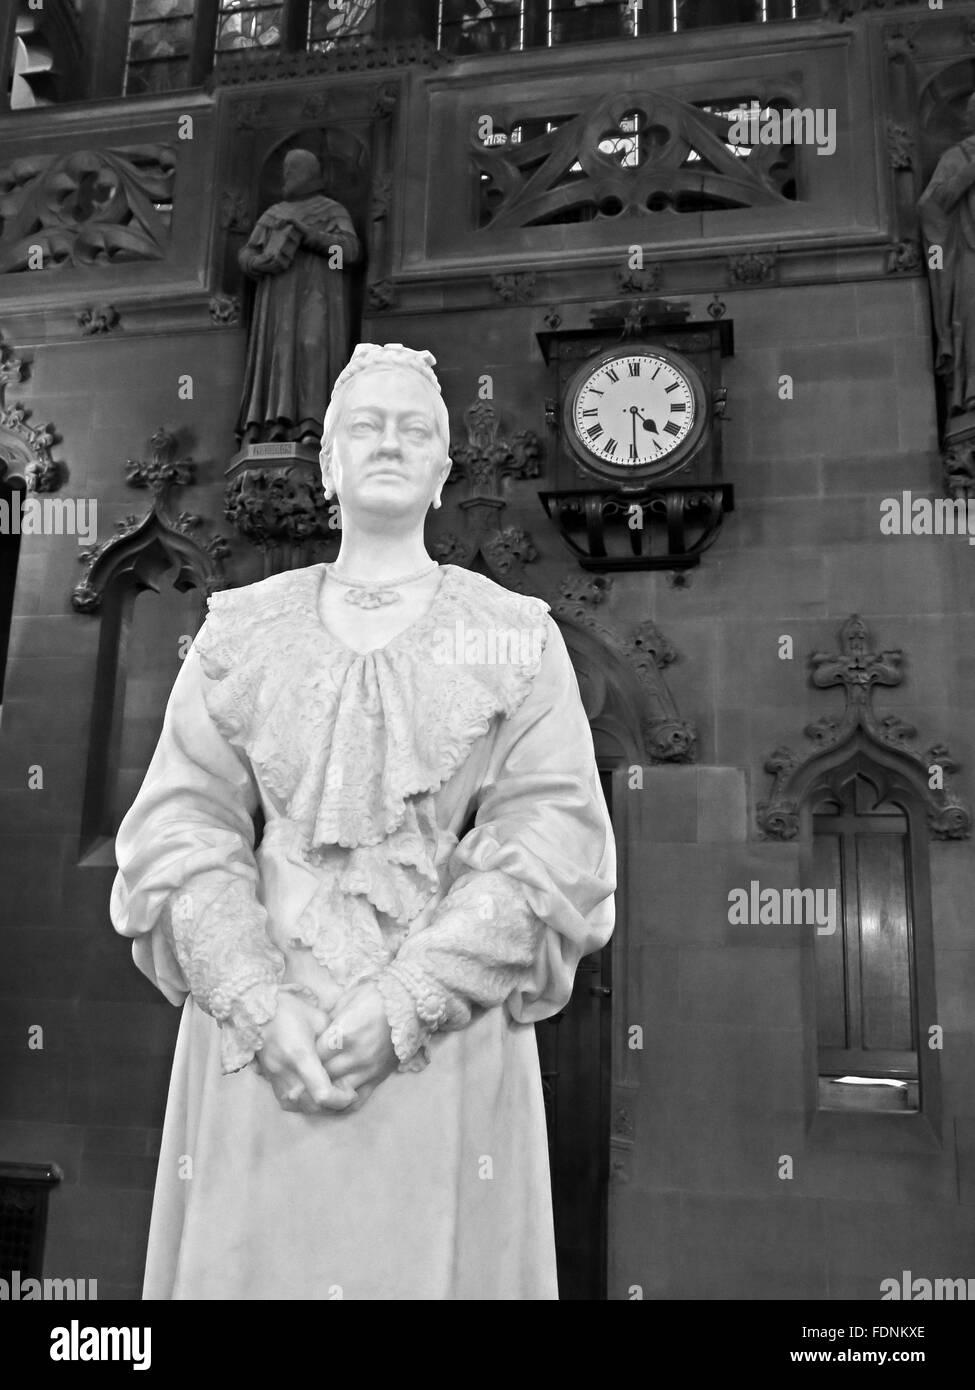 John Rylands Library Interior,Deansgate,Manchester,England,UK - Enriqueta Augustina Rylands (1907) statue Mono - Stock Image